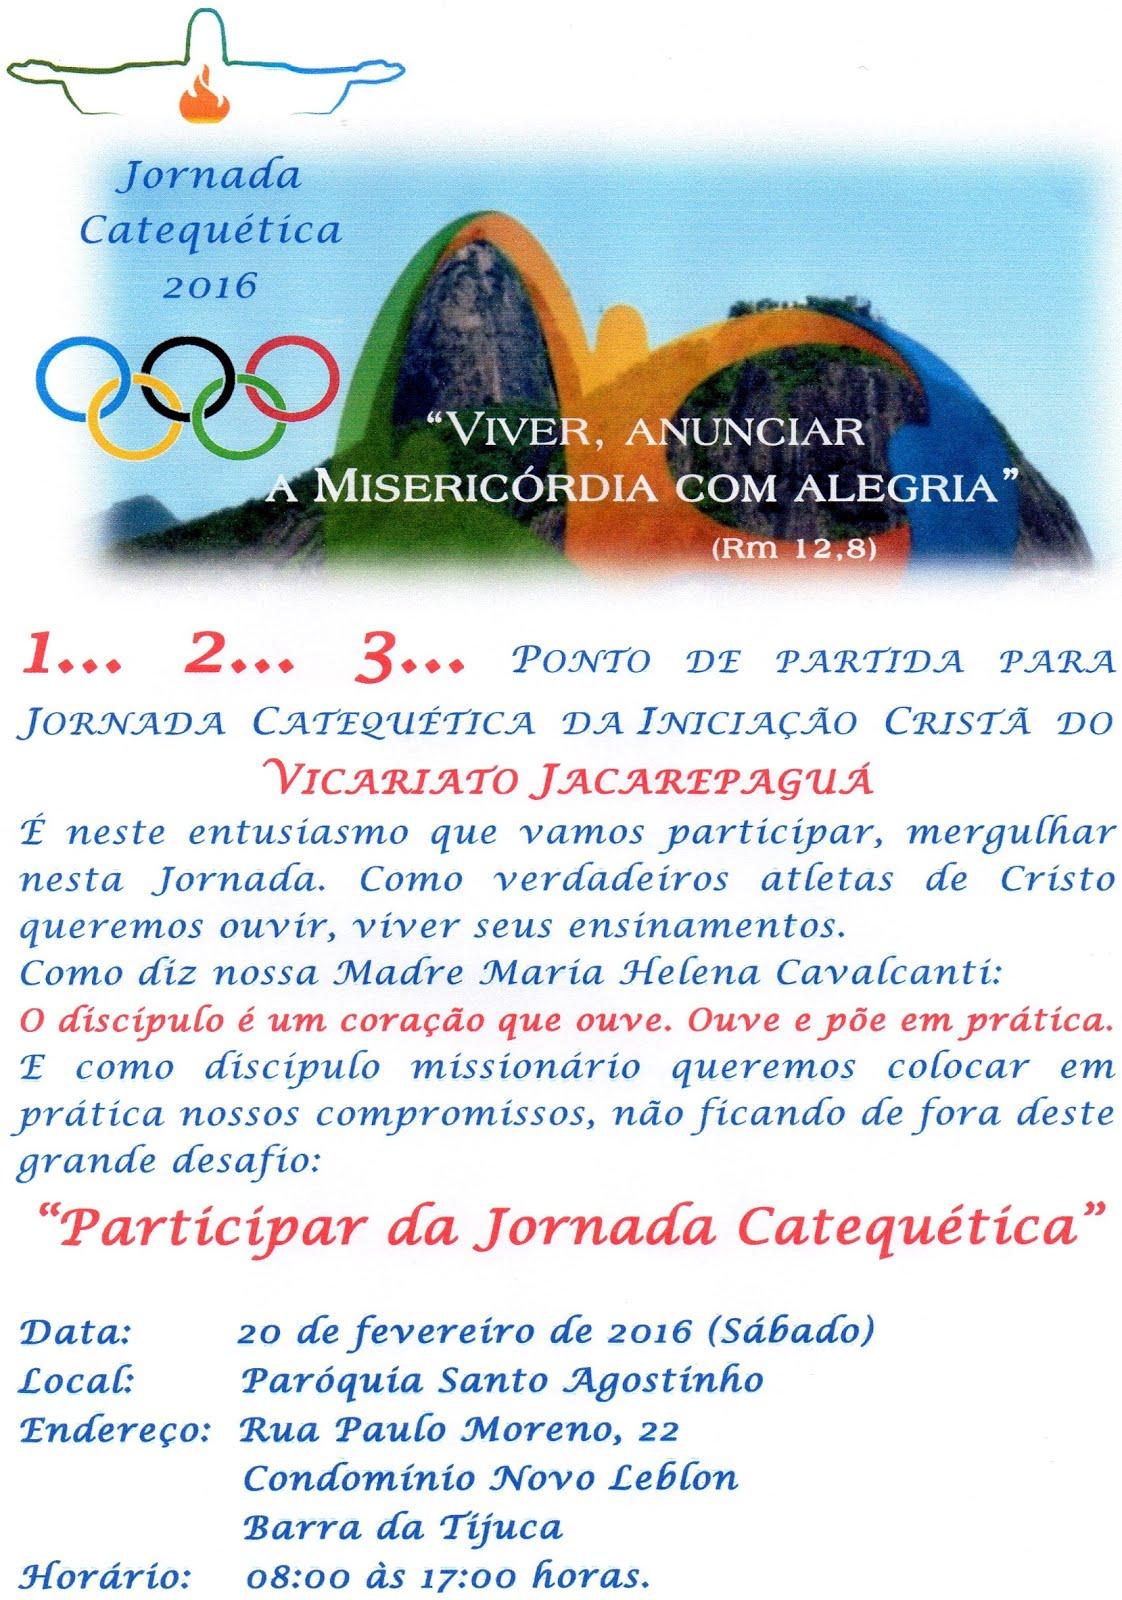 Atenção Vicariato Jacarepaguá!